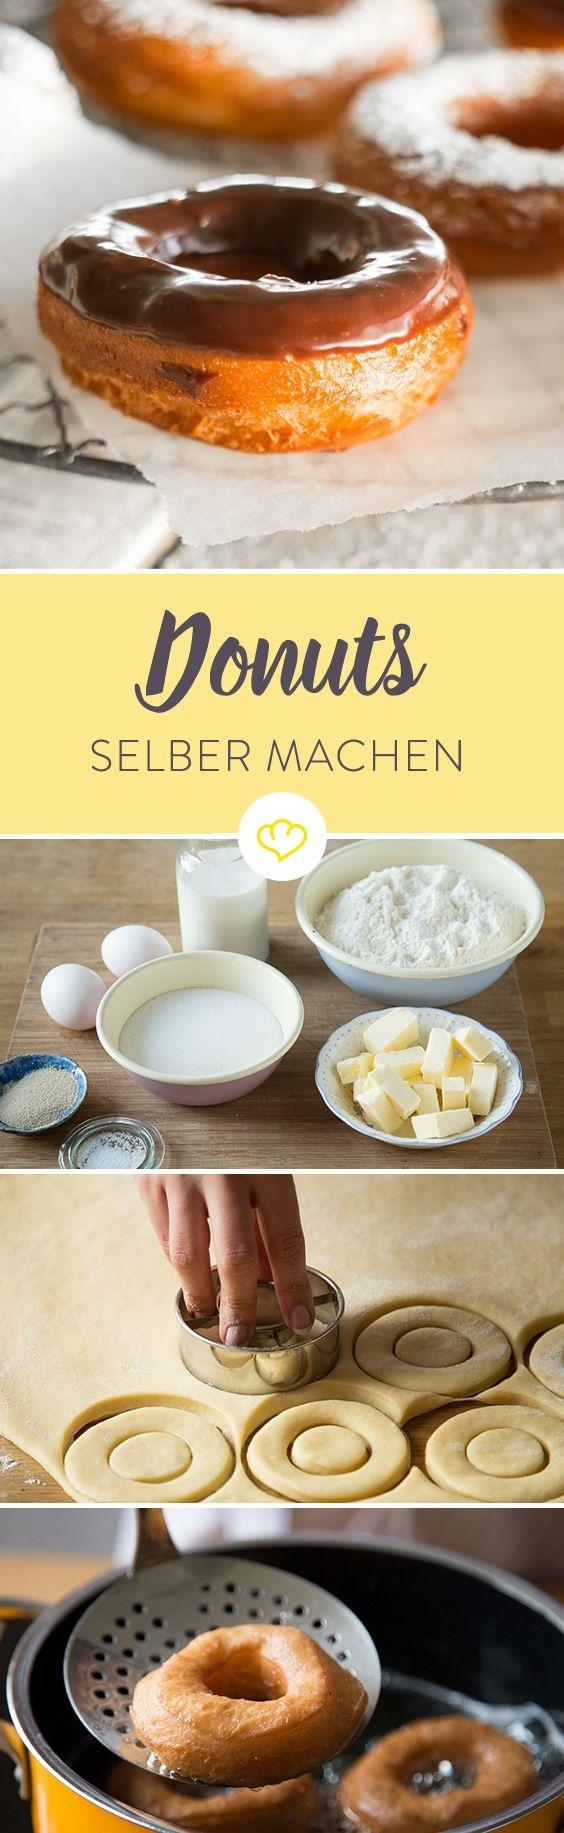 Donuts selber machen: So backst du deine Lieblingskringel ...